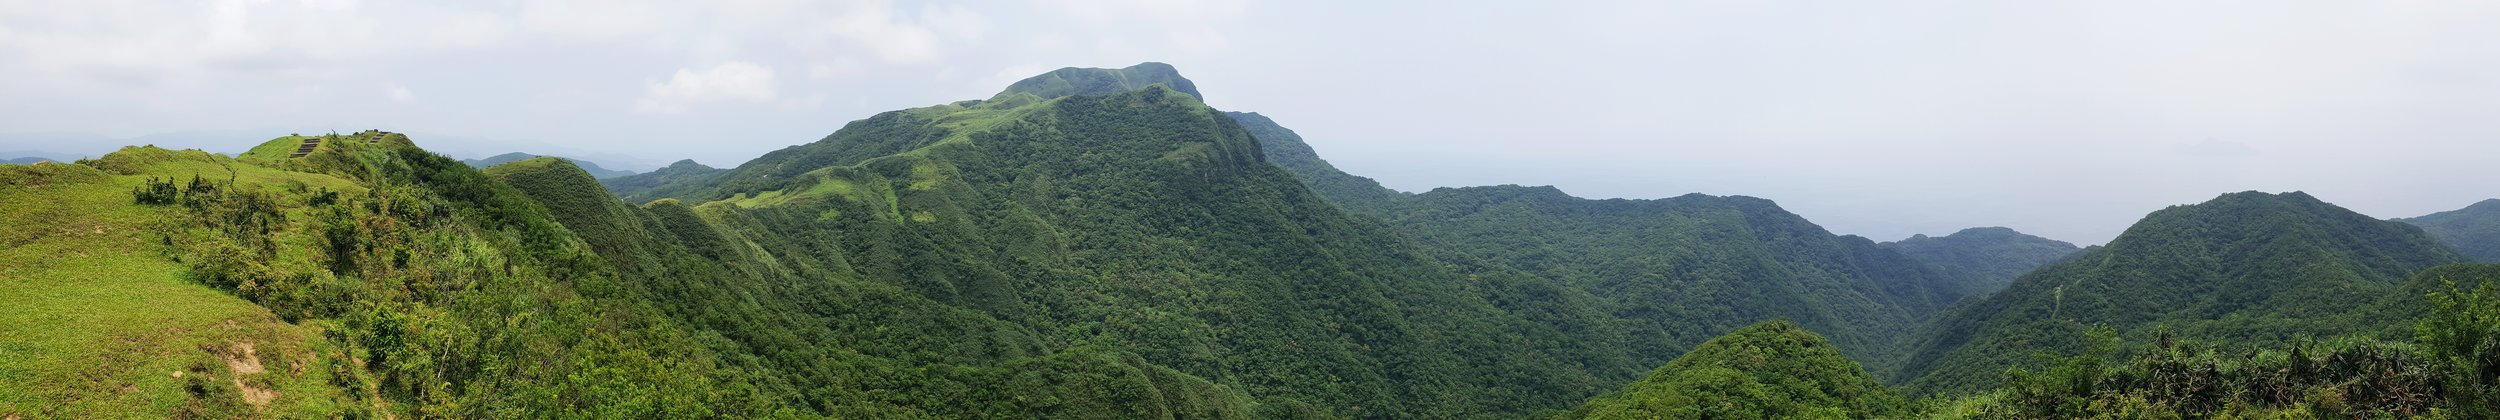 Trail panarama with the summit of Mt Wankengtou